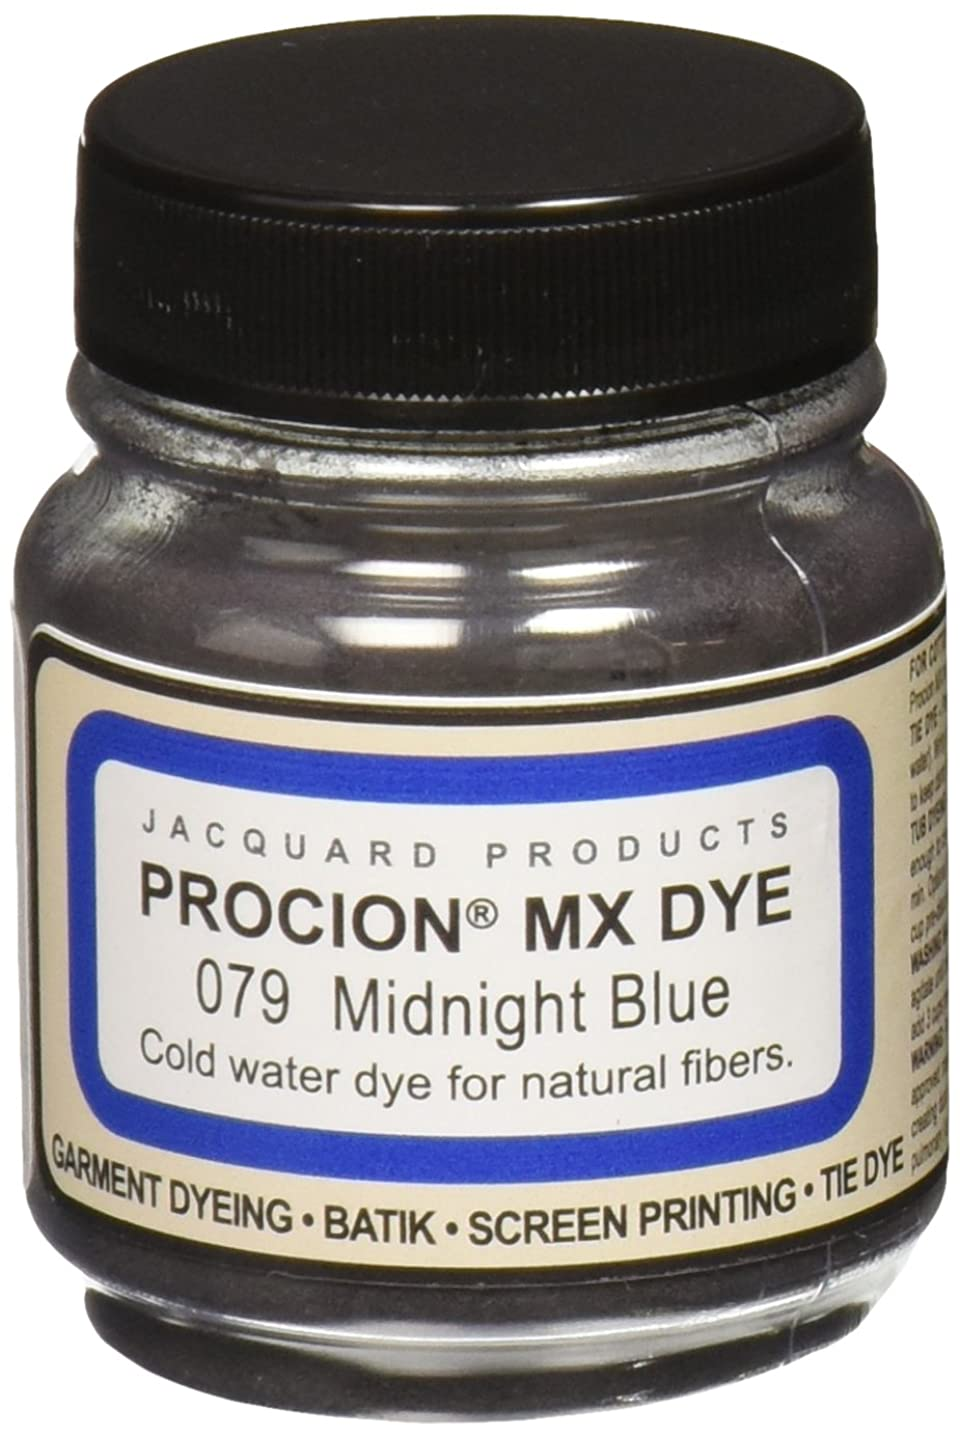 Jacquard Products Procion MX Dye, 2/3-Ounce, Midnight Blue